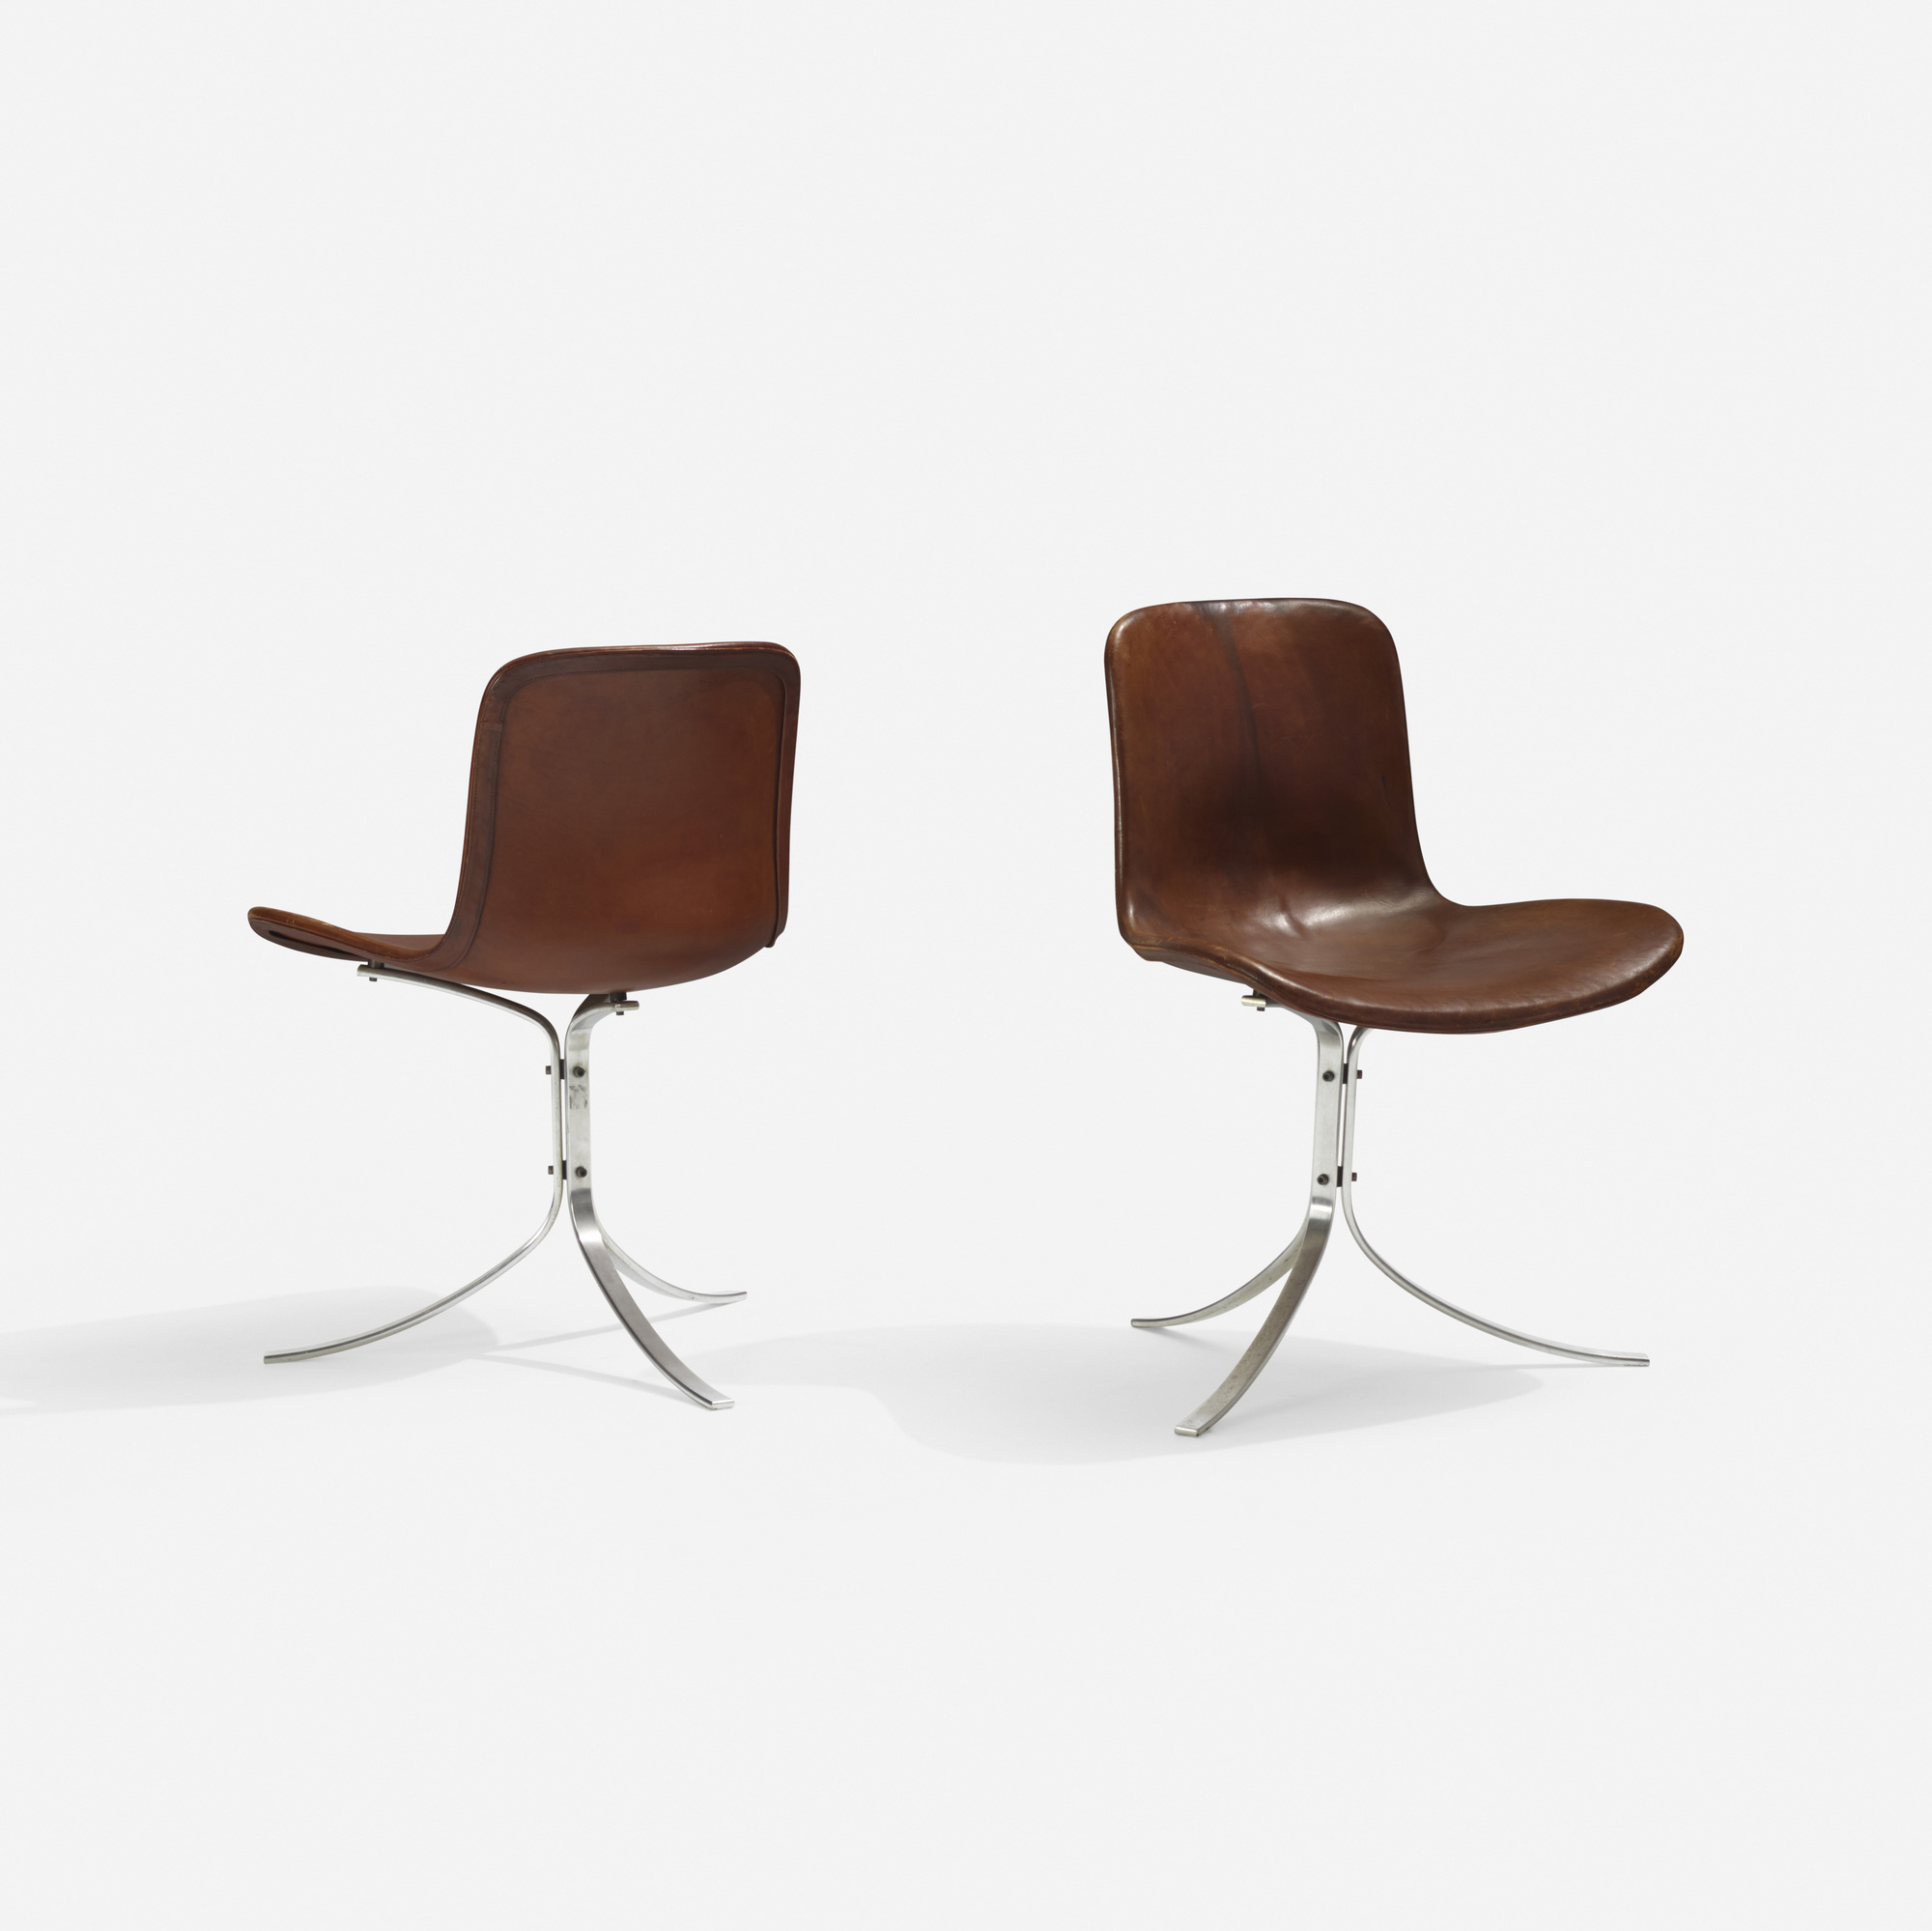 137: Poul Kjaerholm / PK 9 chairs, pair (2 of 3)